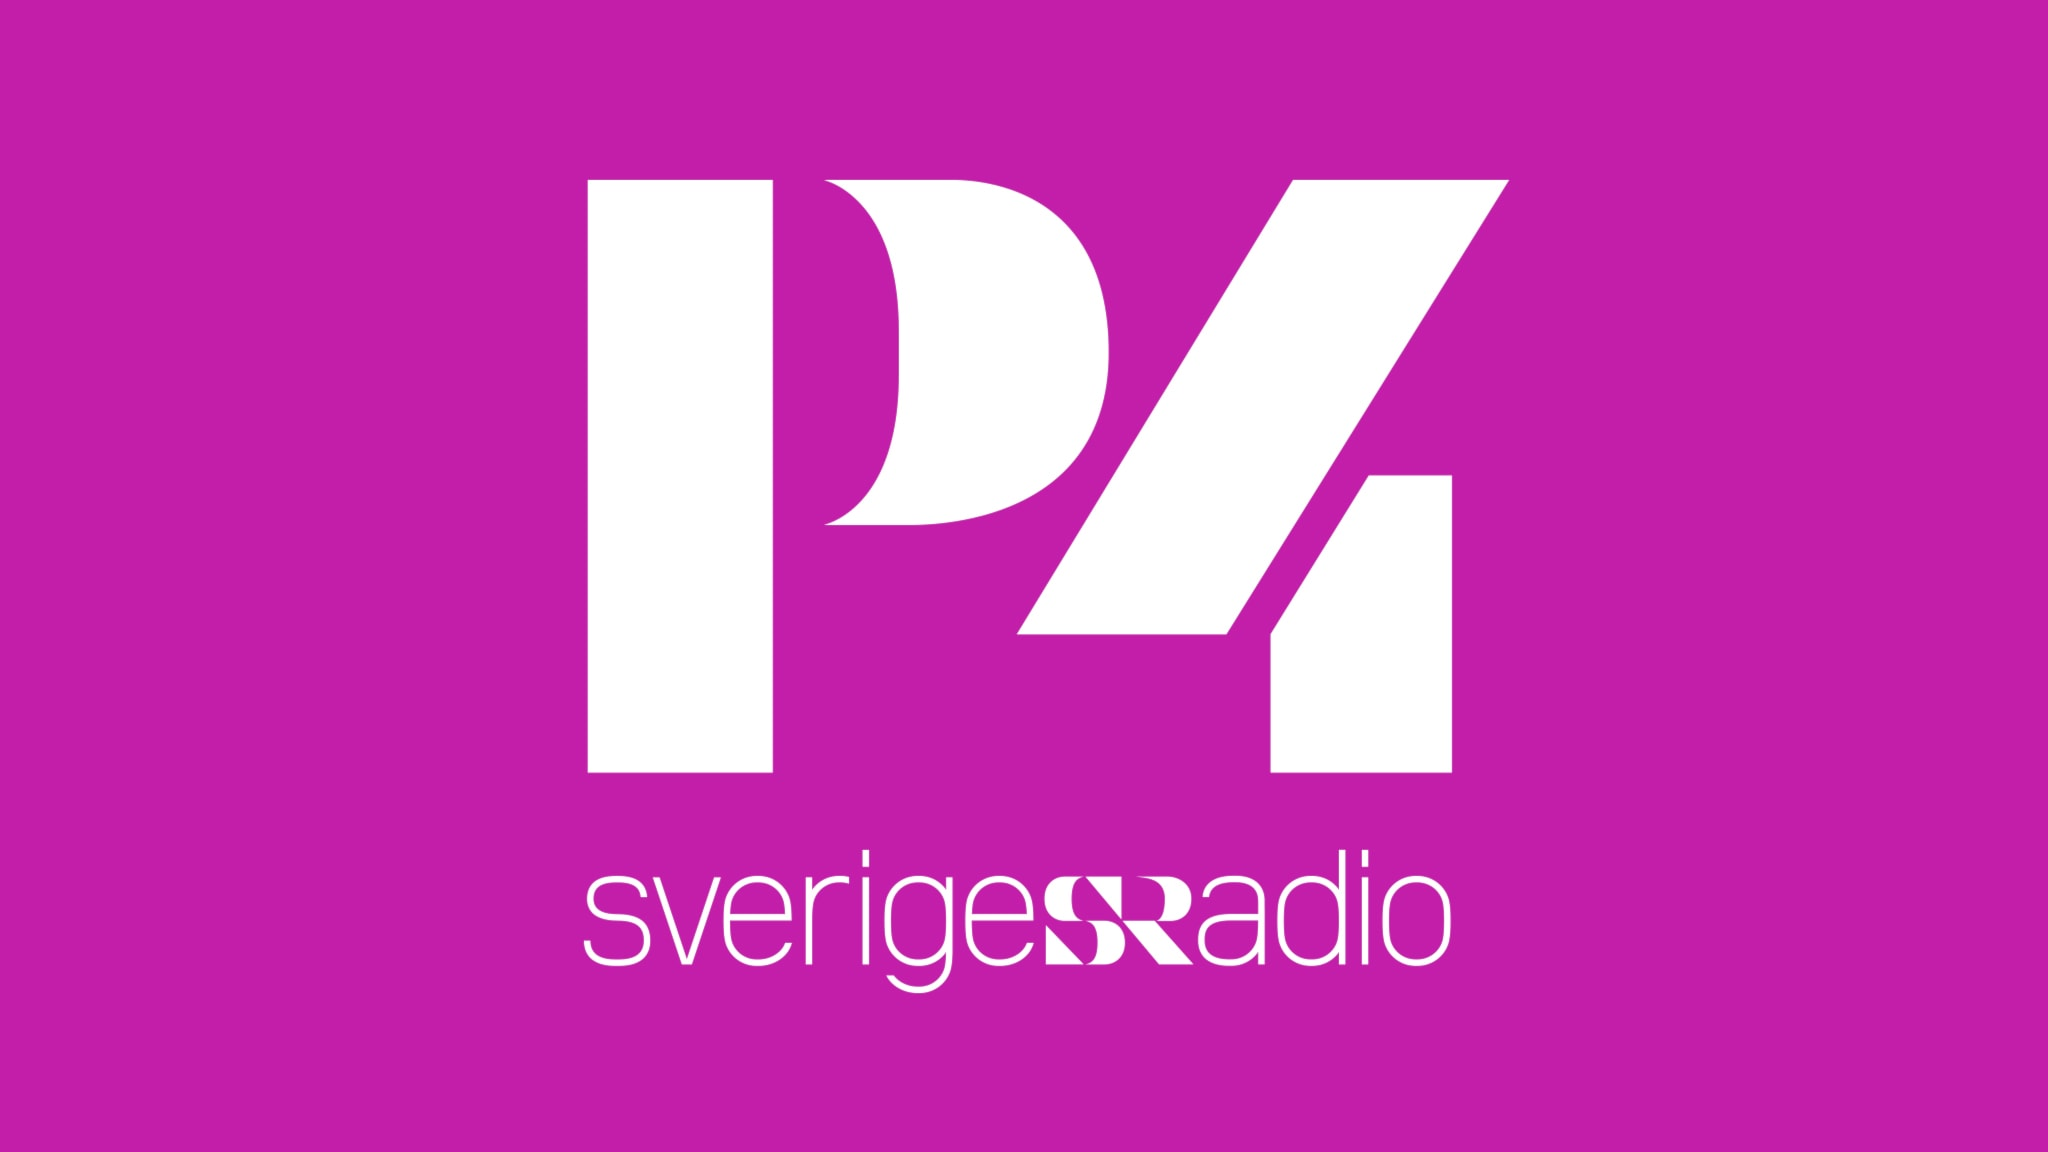 Trafik P4 Göteborg 20180626 07.34 (01.58) - spela